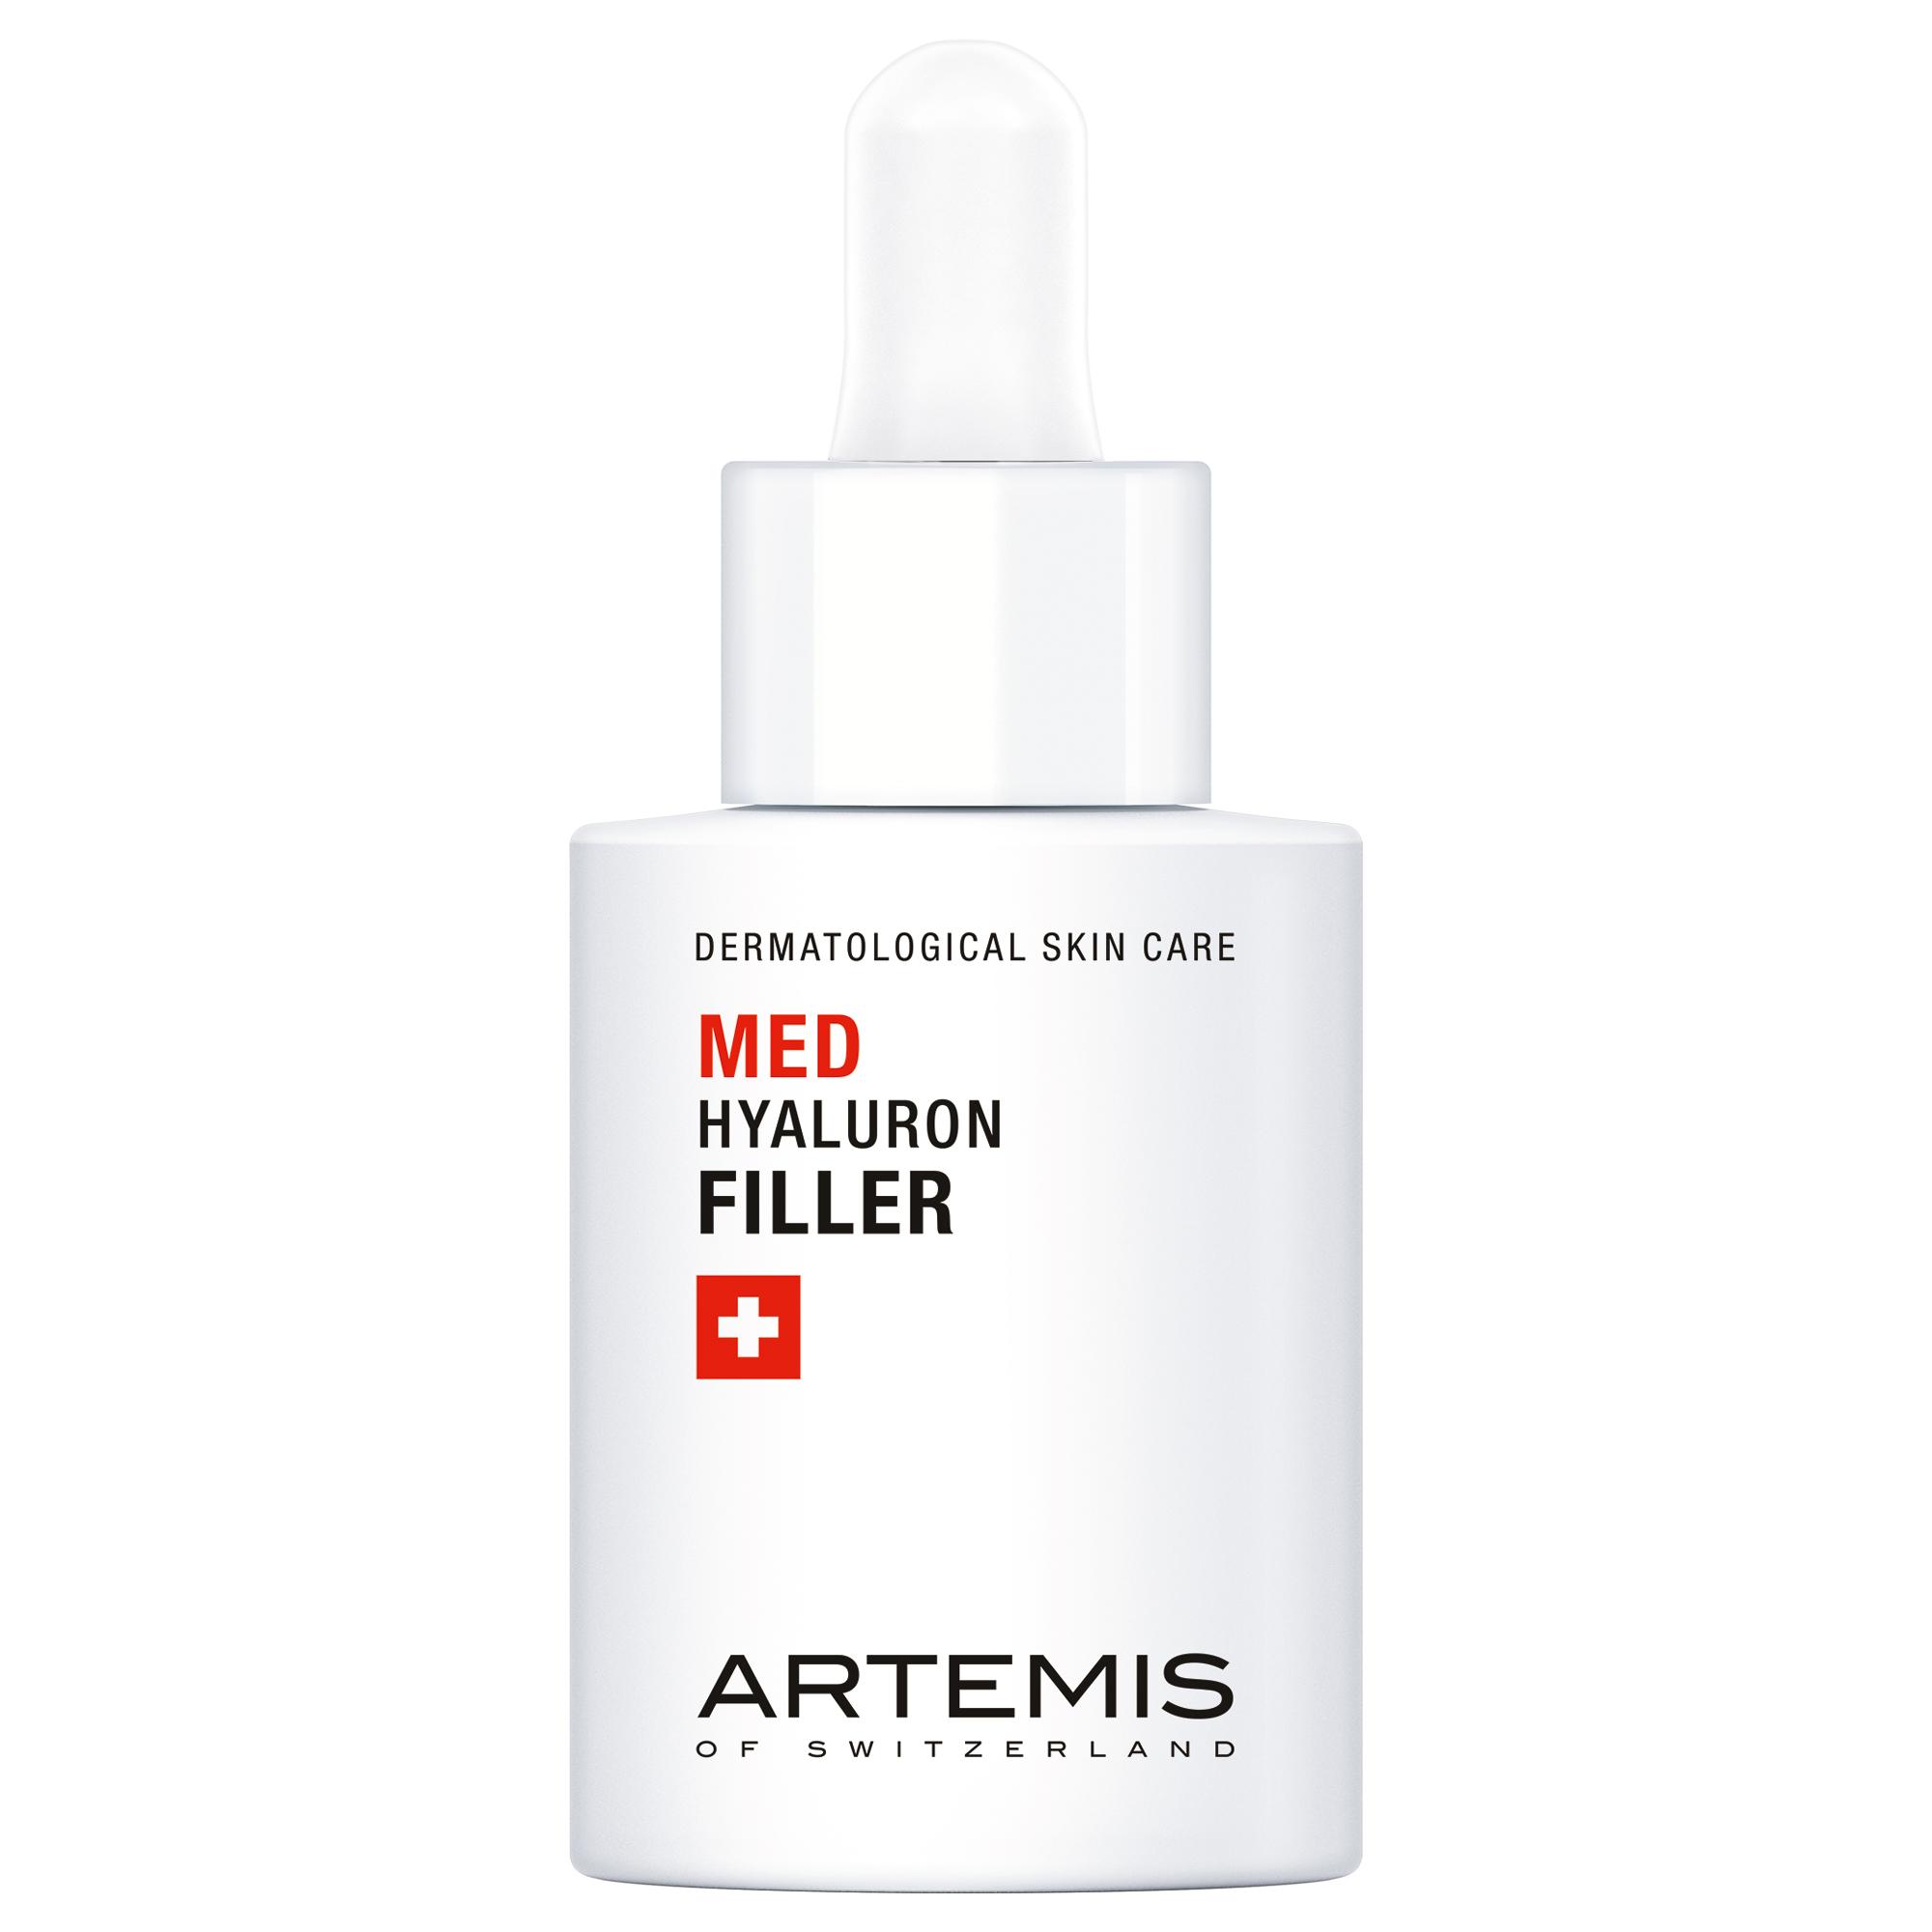 Artemis MED Hyaluron Filler 30ml